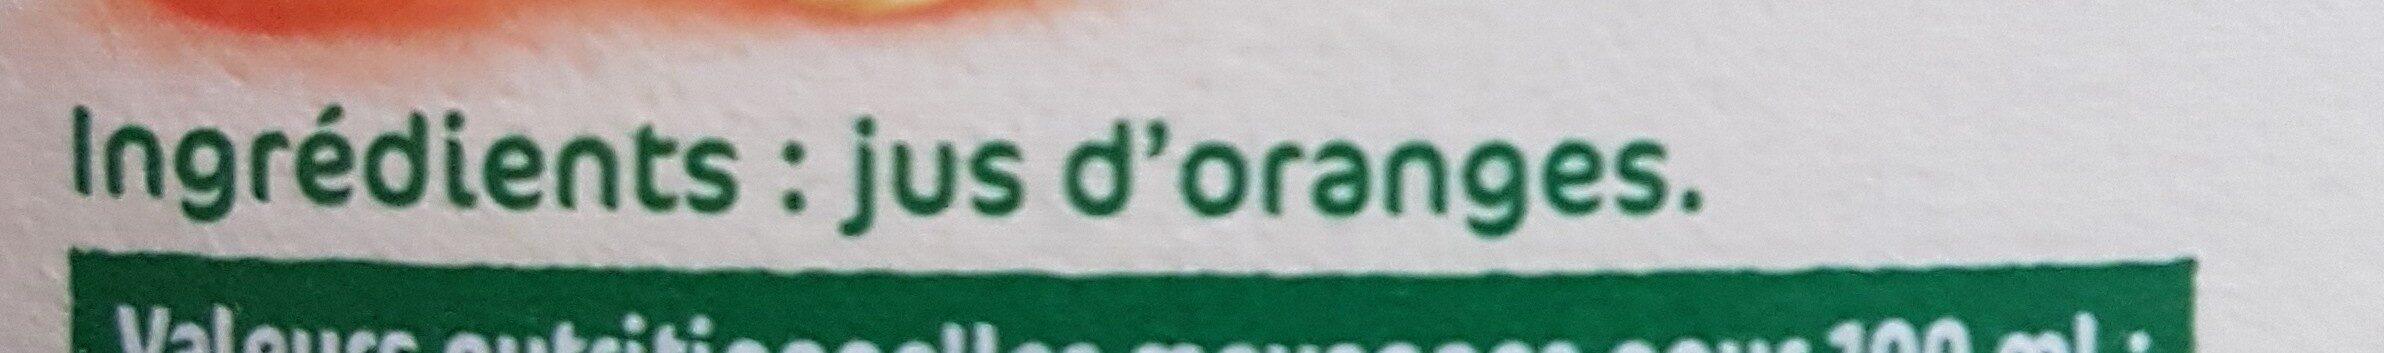 jus orange - Ingrédients - fr